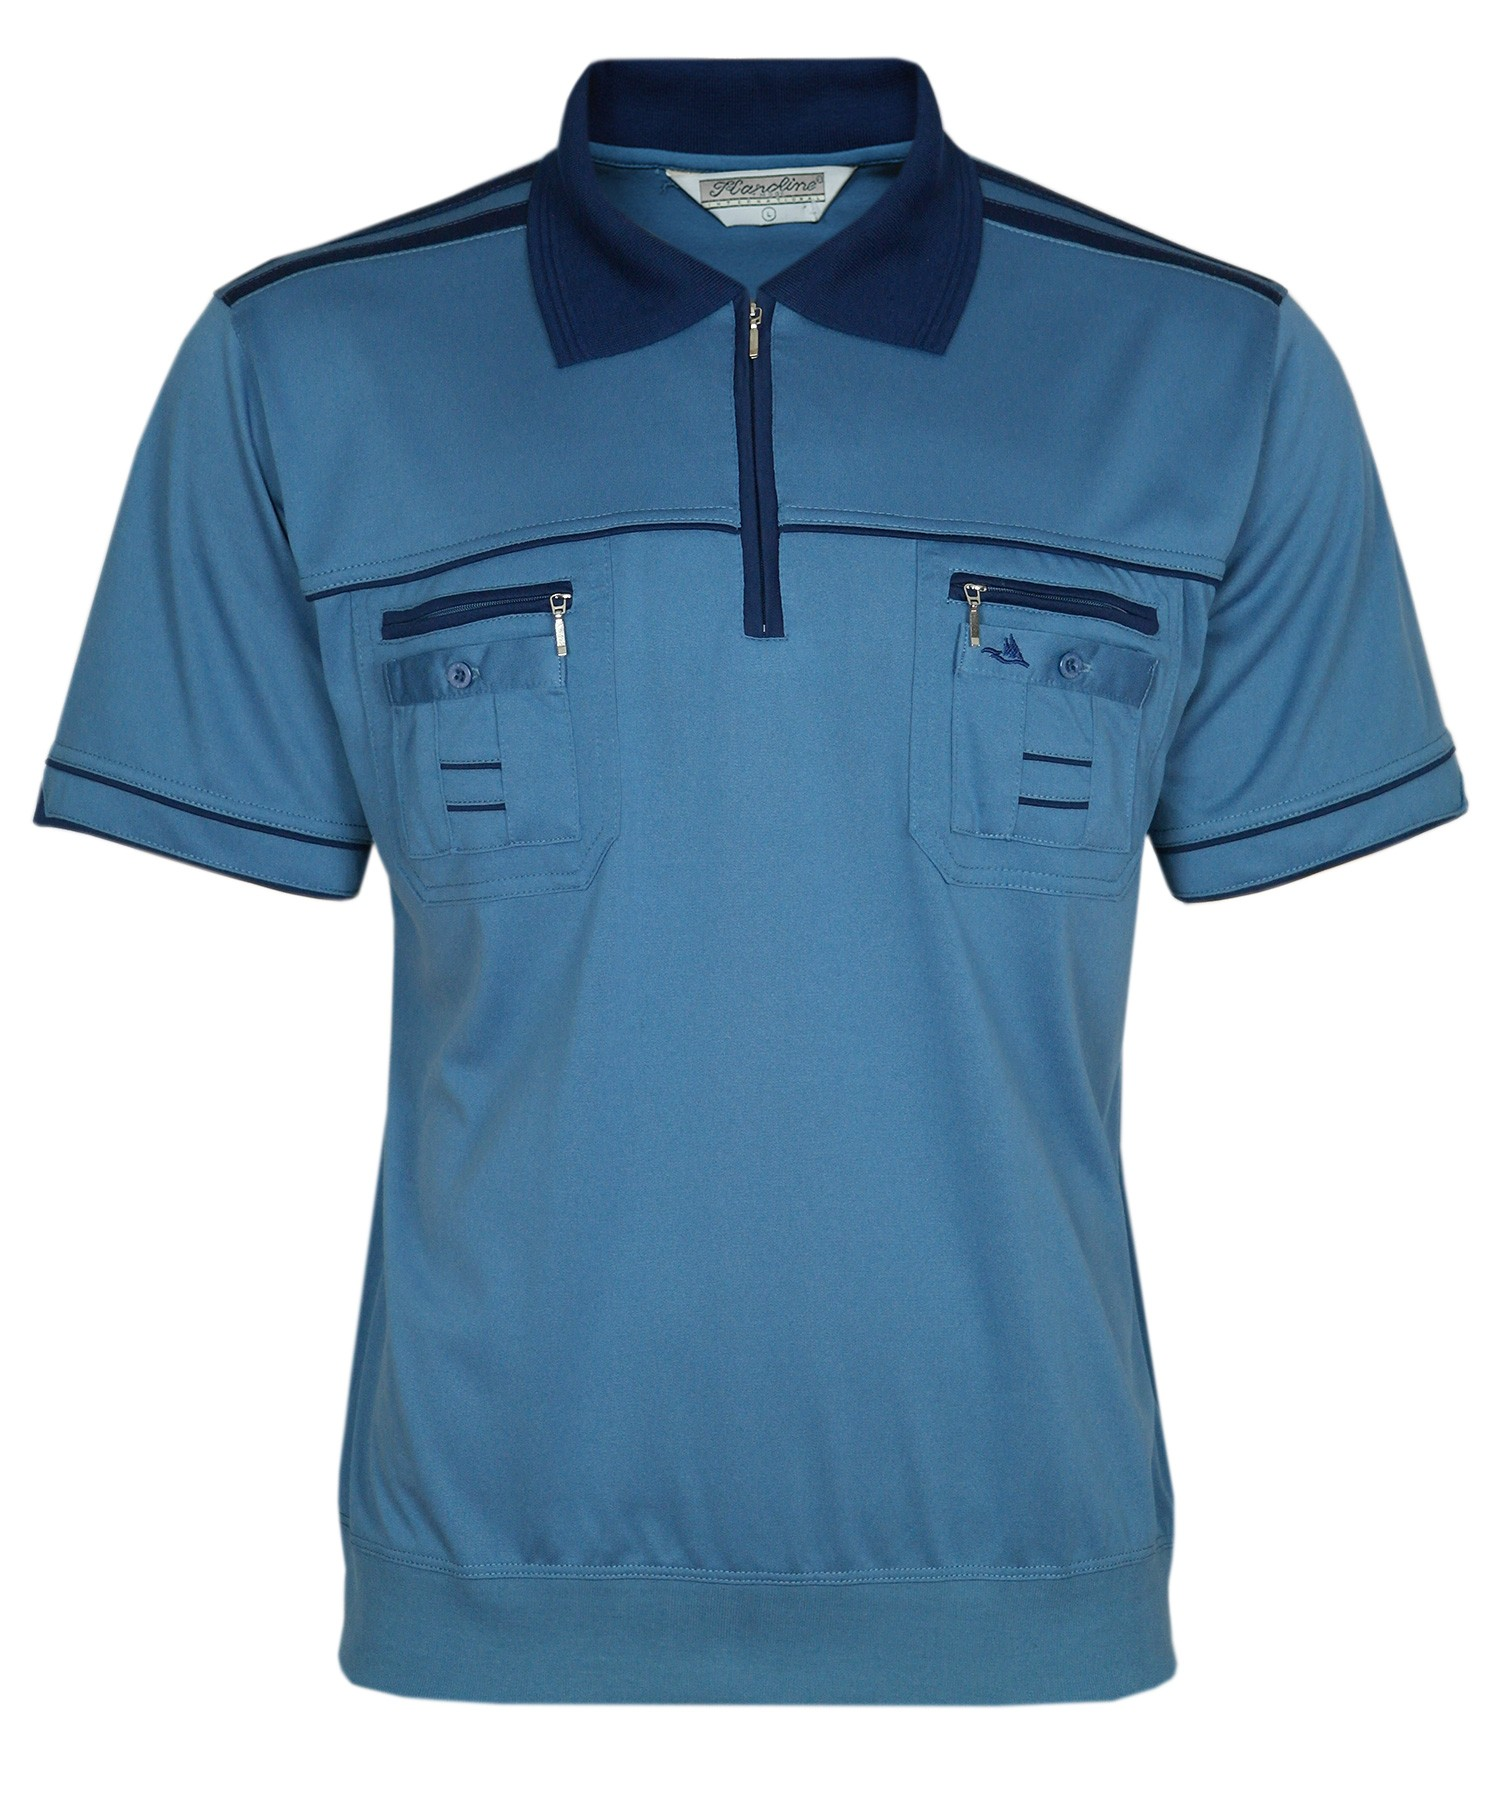 Blousonshirts Poloshirts mit kurzen Ärmeln - Stahlblau